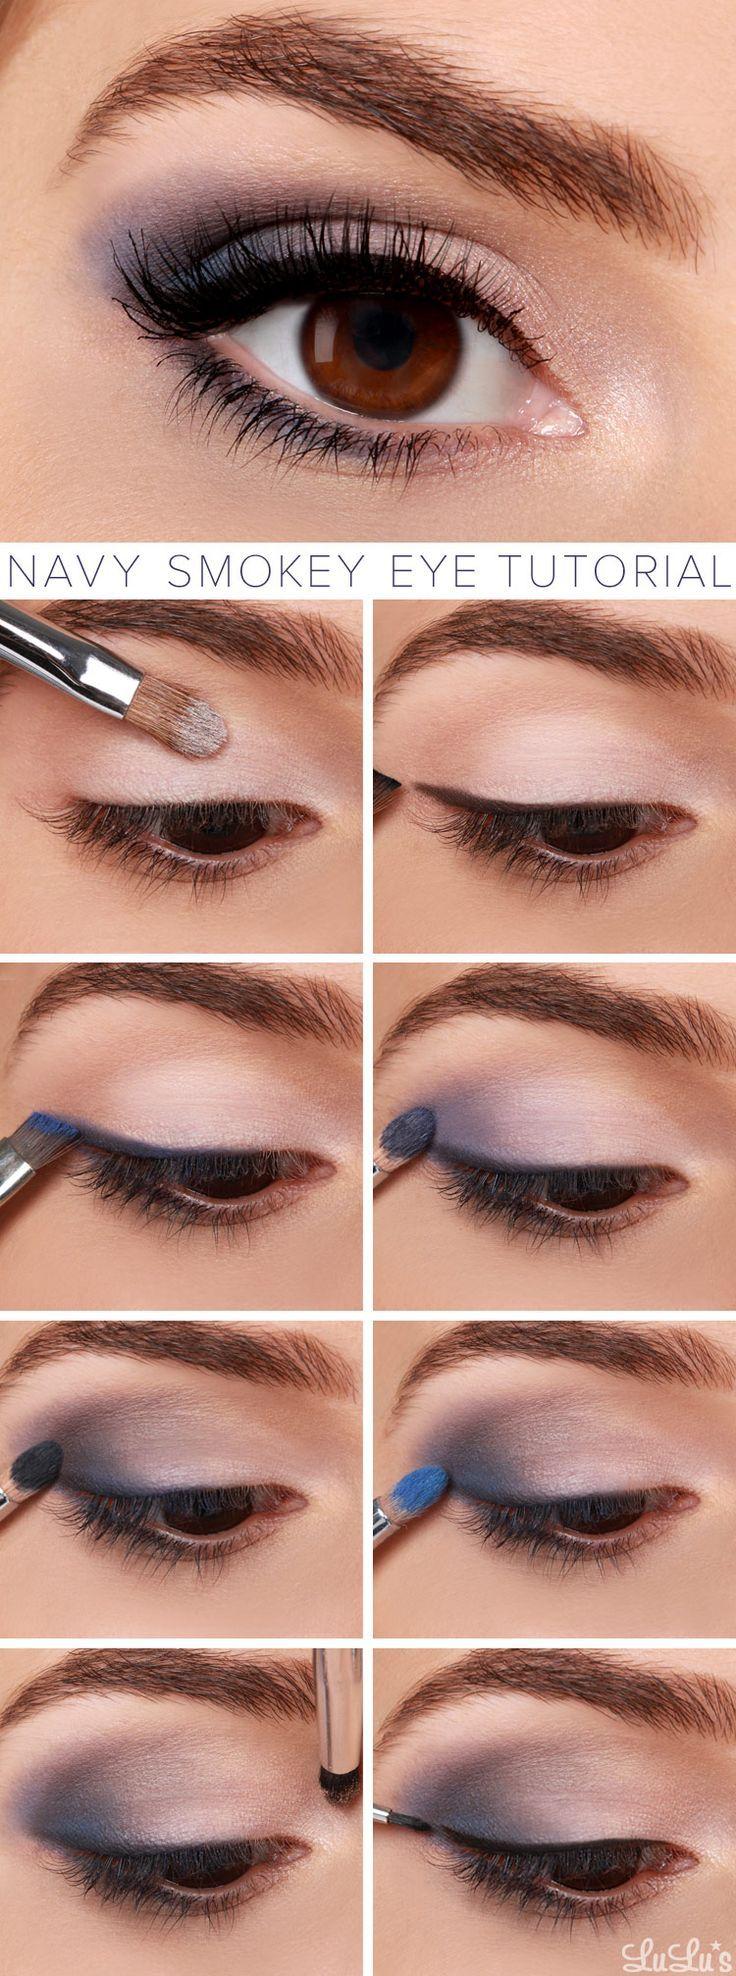 Top 10 Easiest Makeup Tutorials For Busy Ladies – Top Inspired